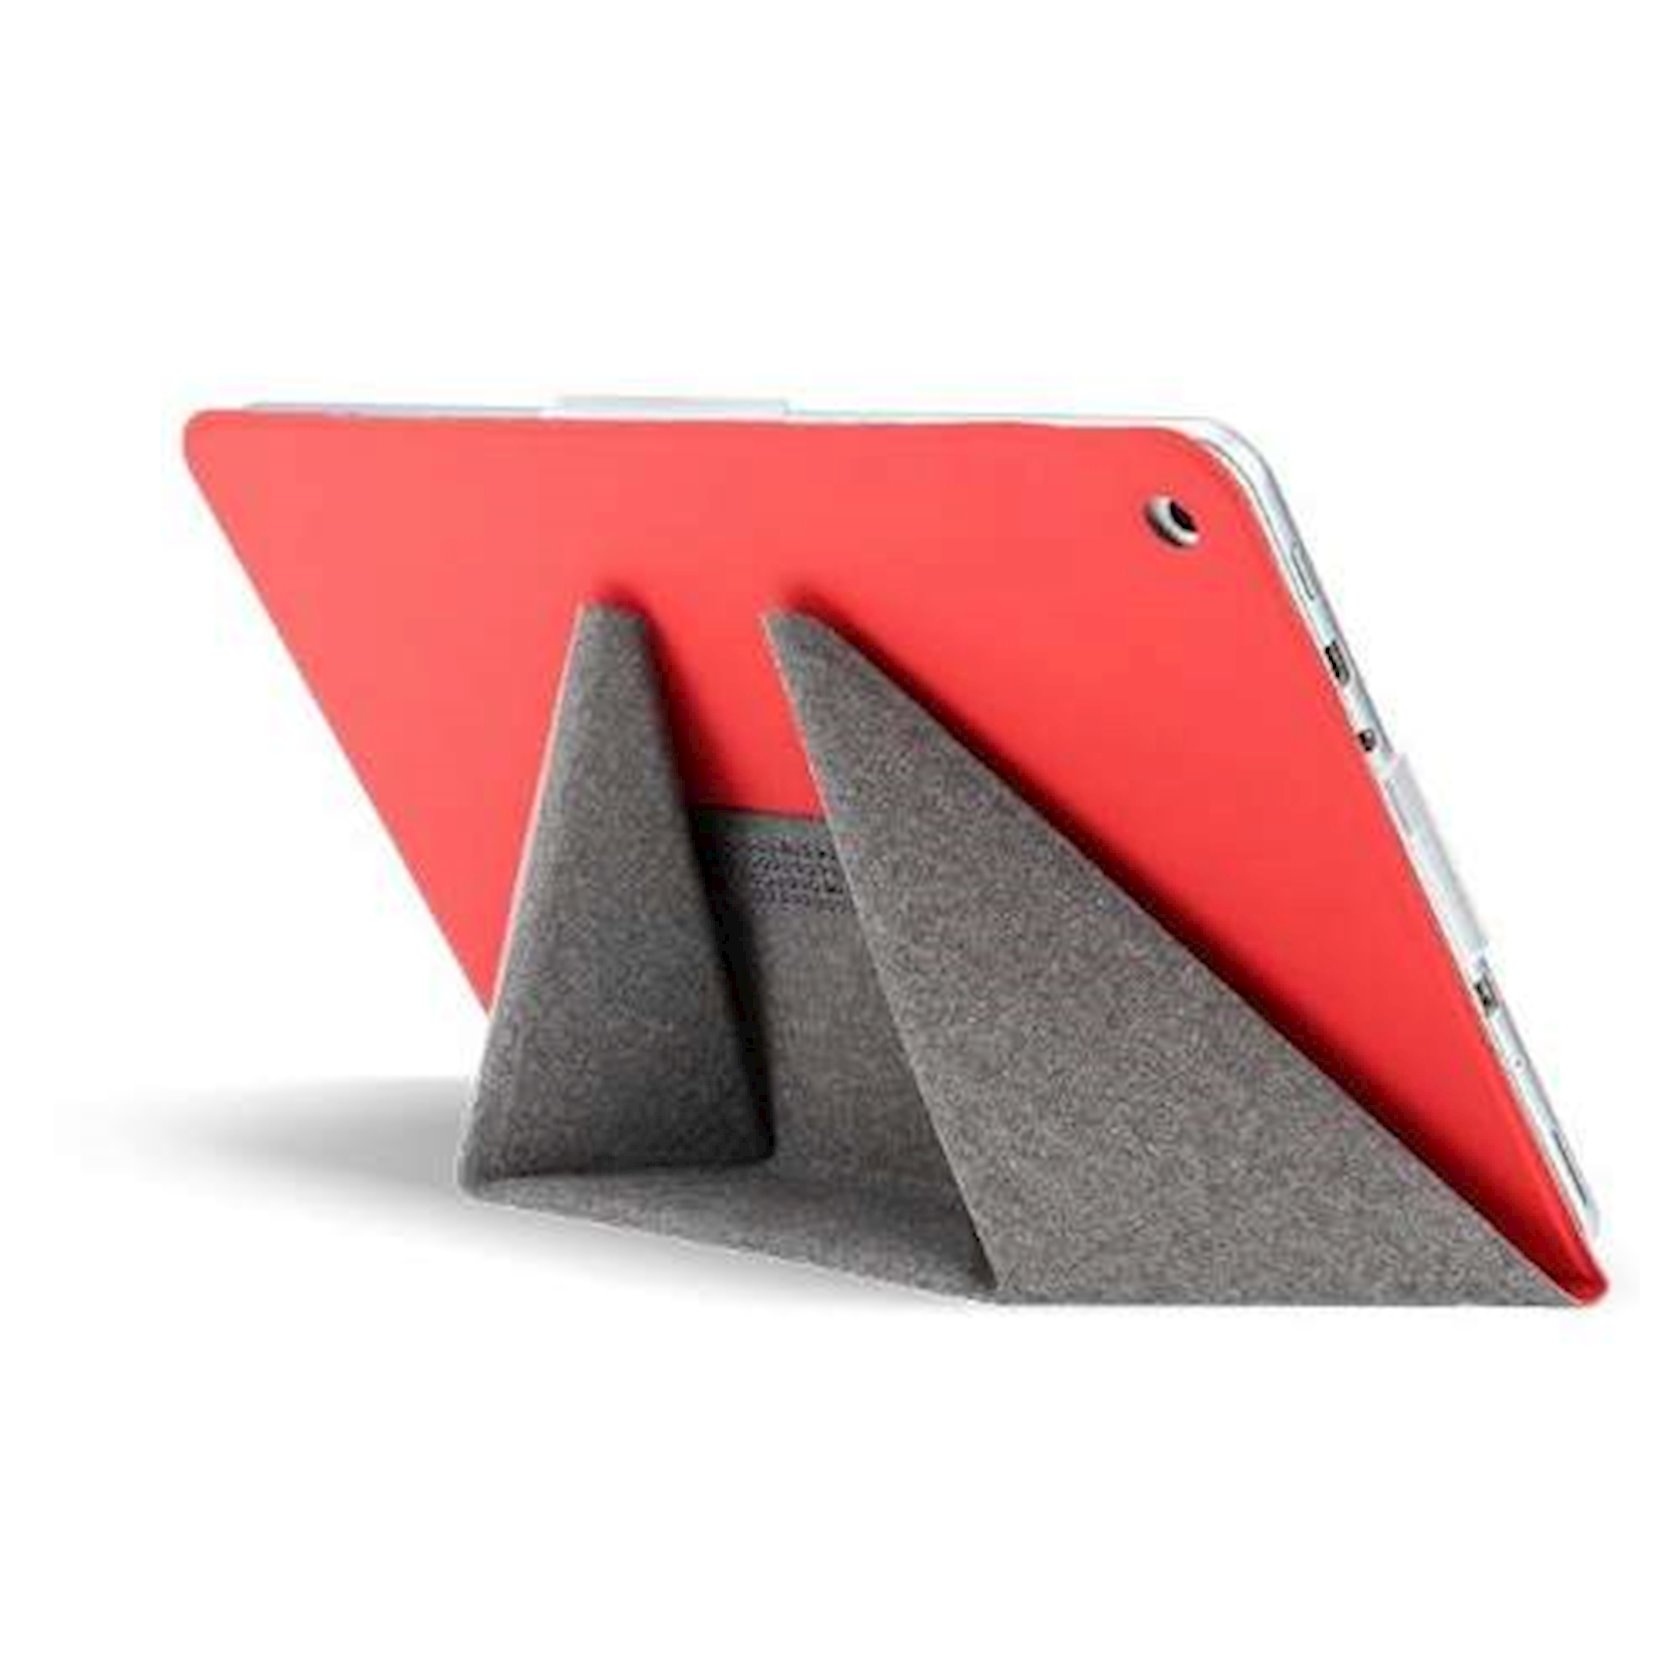 Planşet üçün çexol Acer Crunch Cover A3-A10 Qırmızı 25.4 sm